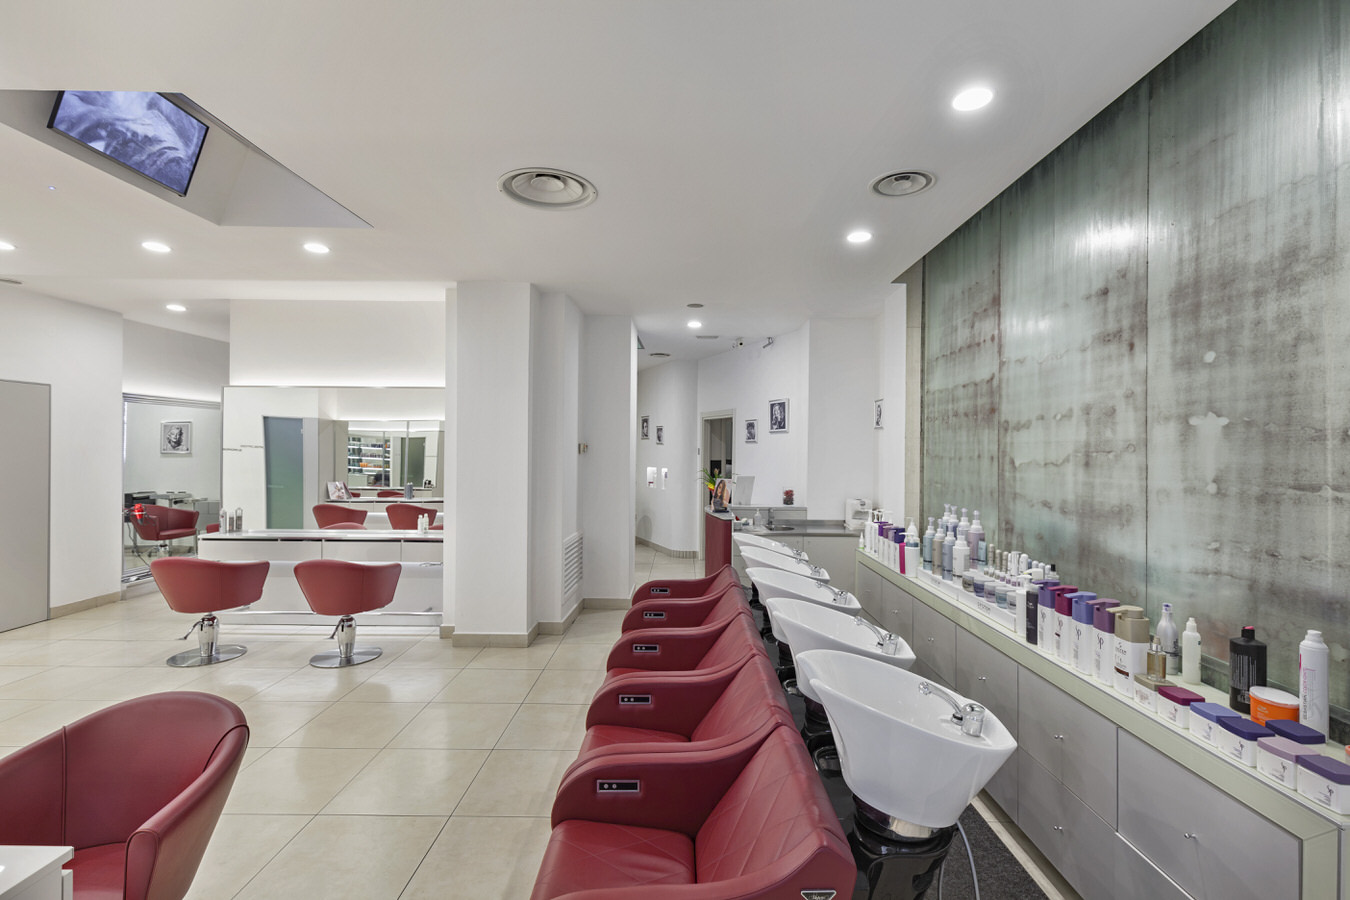 hairstylist-alexim-via-giuseppe-mazzini-16-milano-lavaggi